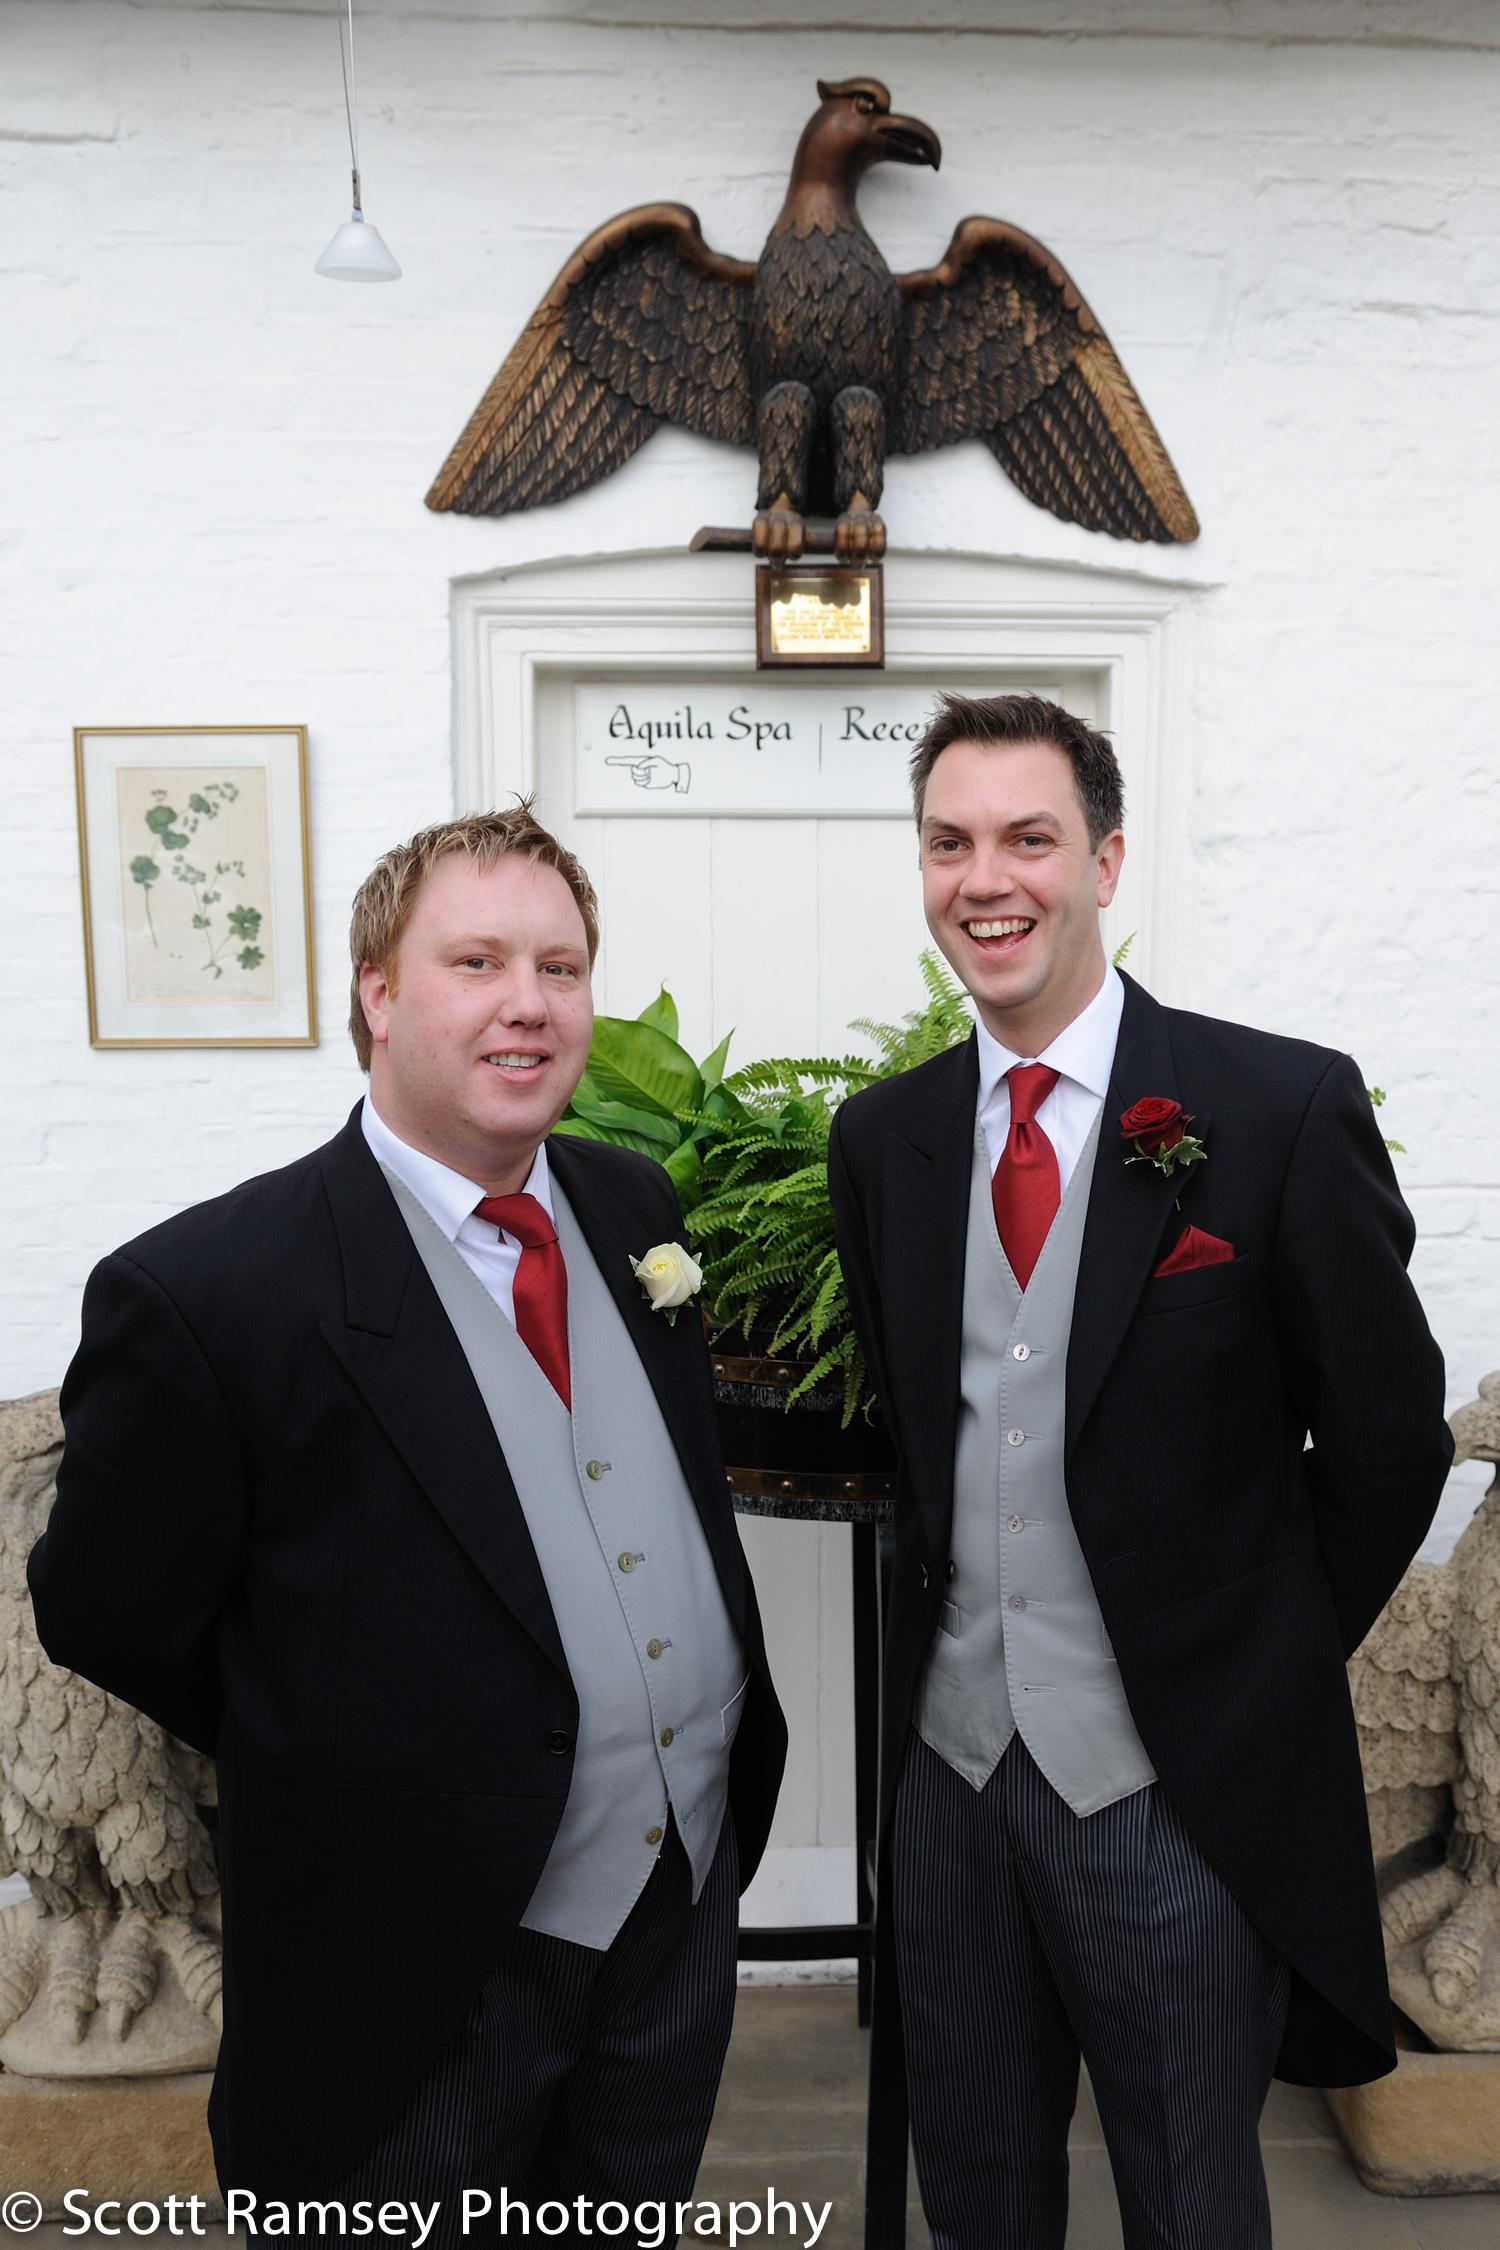 Winter-Wedding-Spread-Eagle-Hotel-Midhurst-Groom-And-Bestman-031